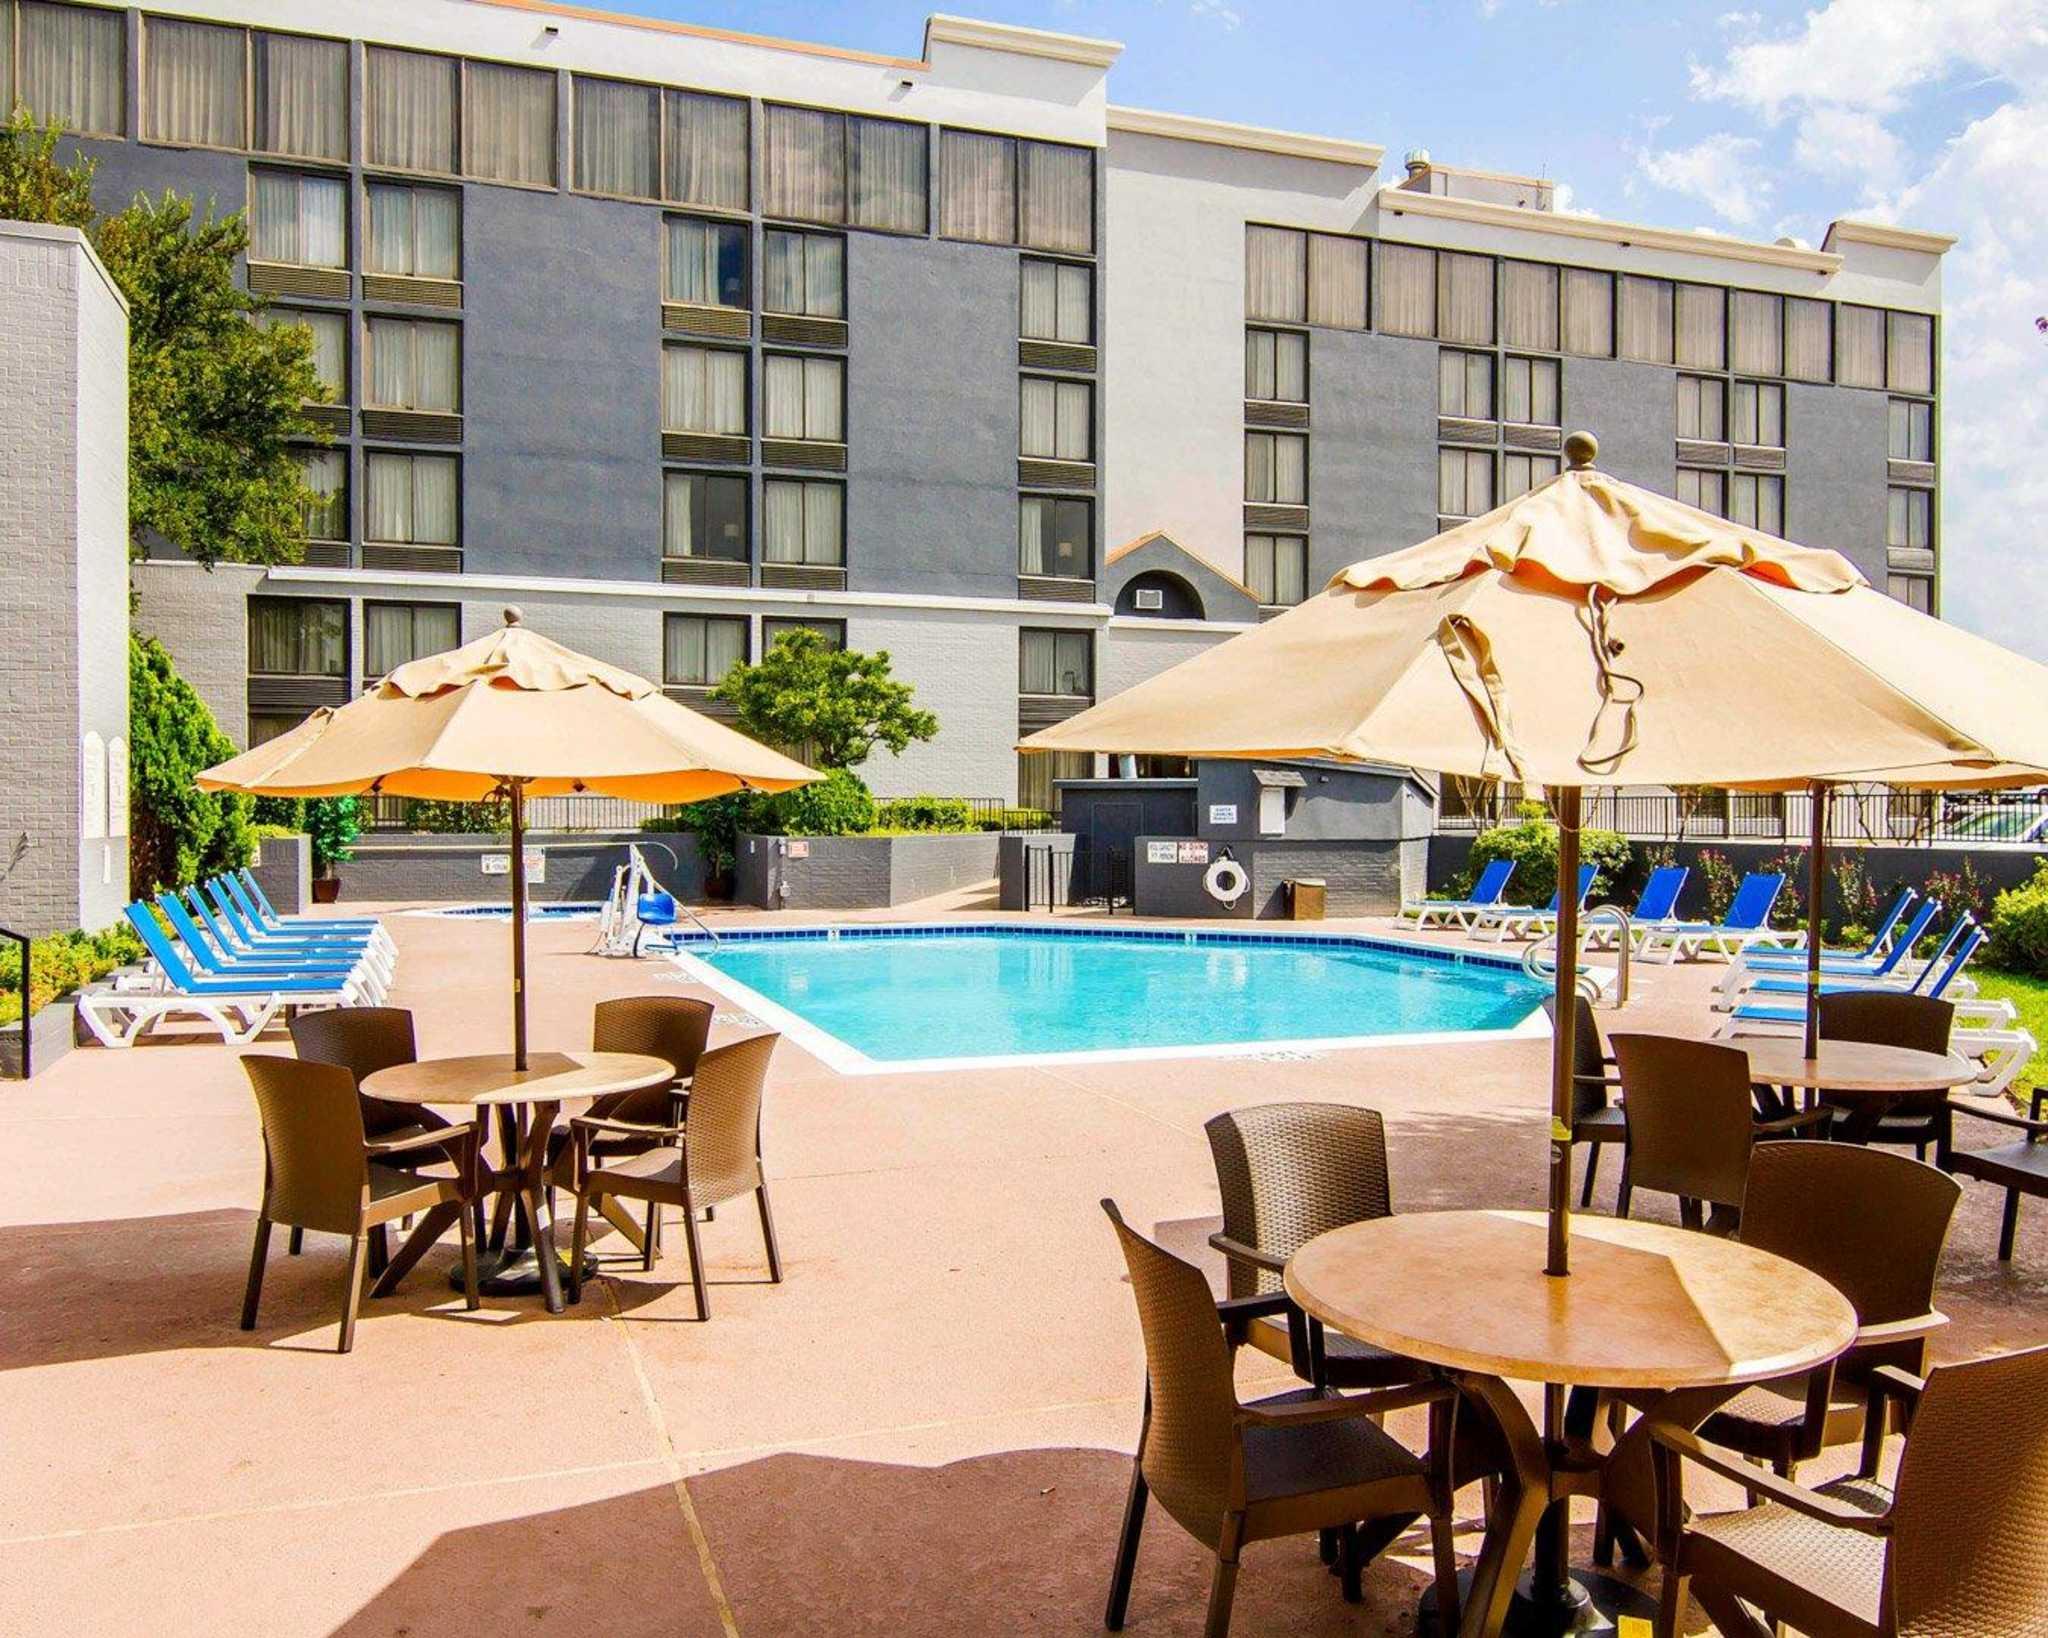 Comfort Inn & Suites Plano East image 0